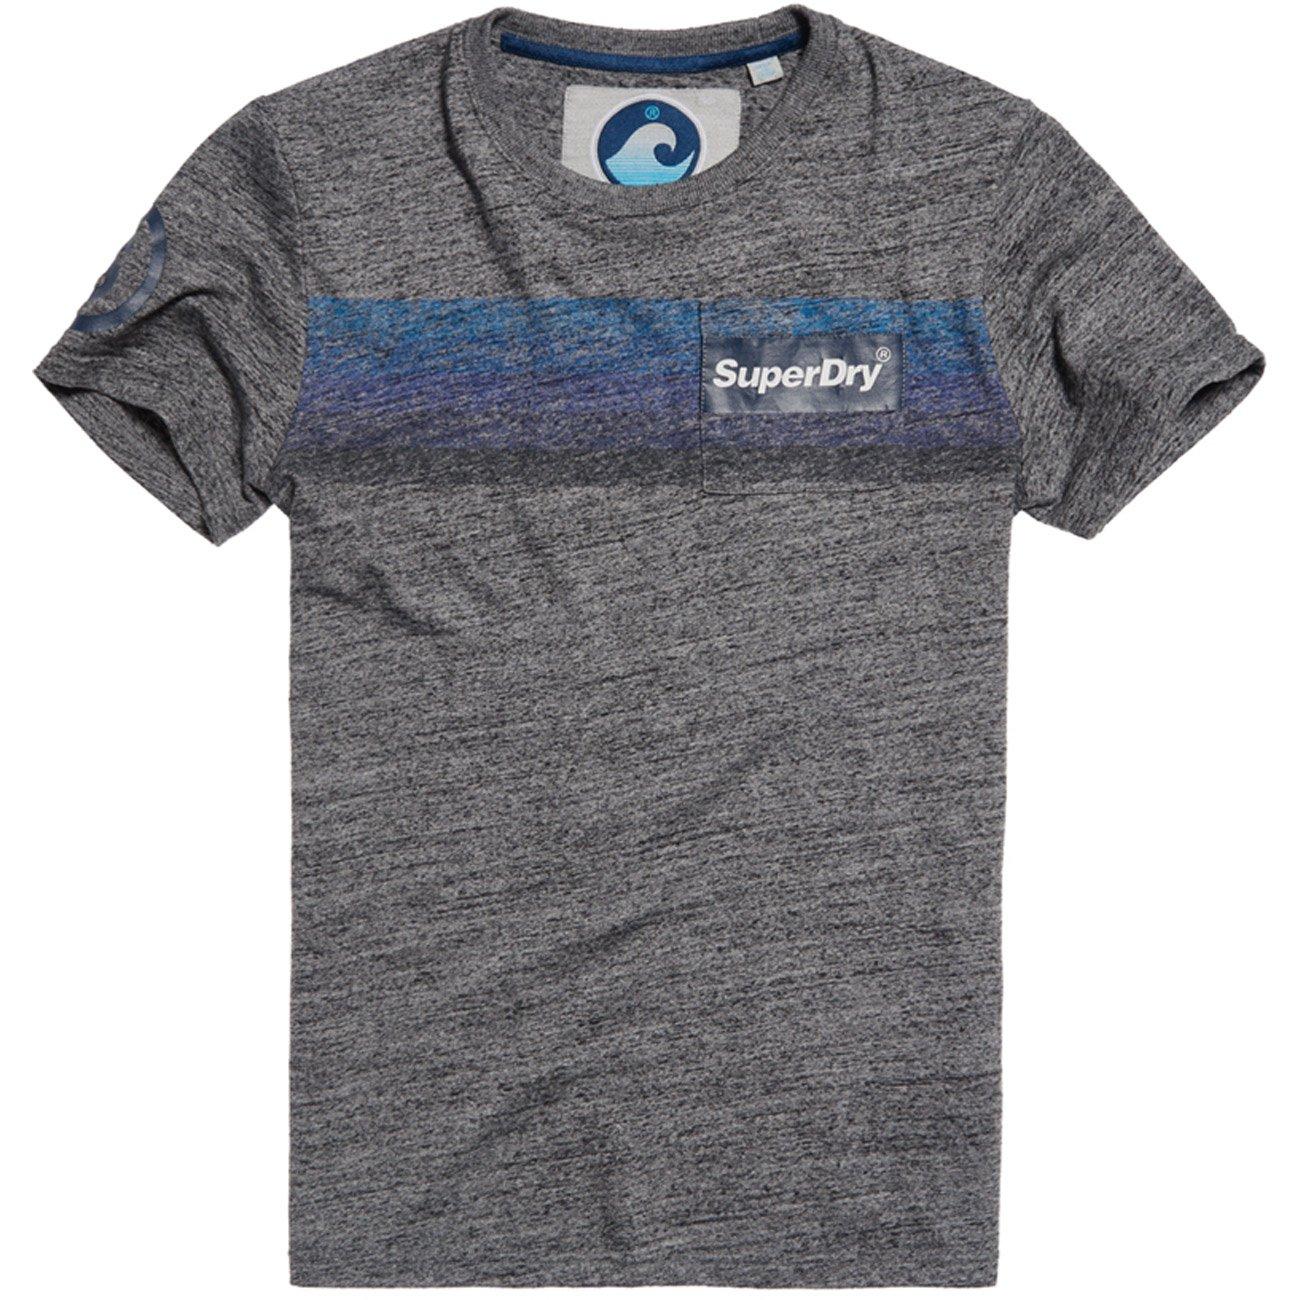 Superdry Mens Super 77 Surf Pocket Tee Mens Grey T-Shirt In Size ...